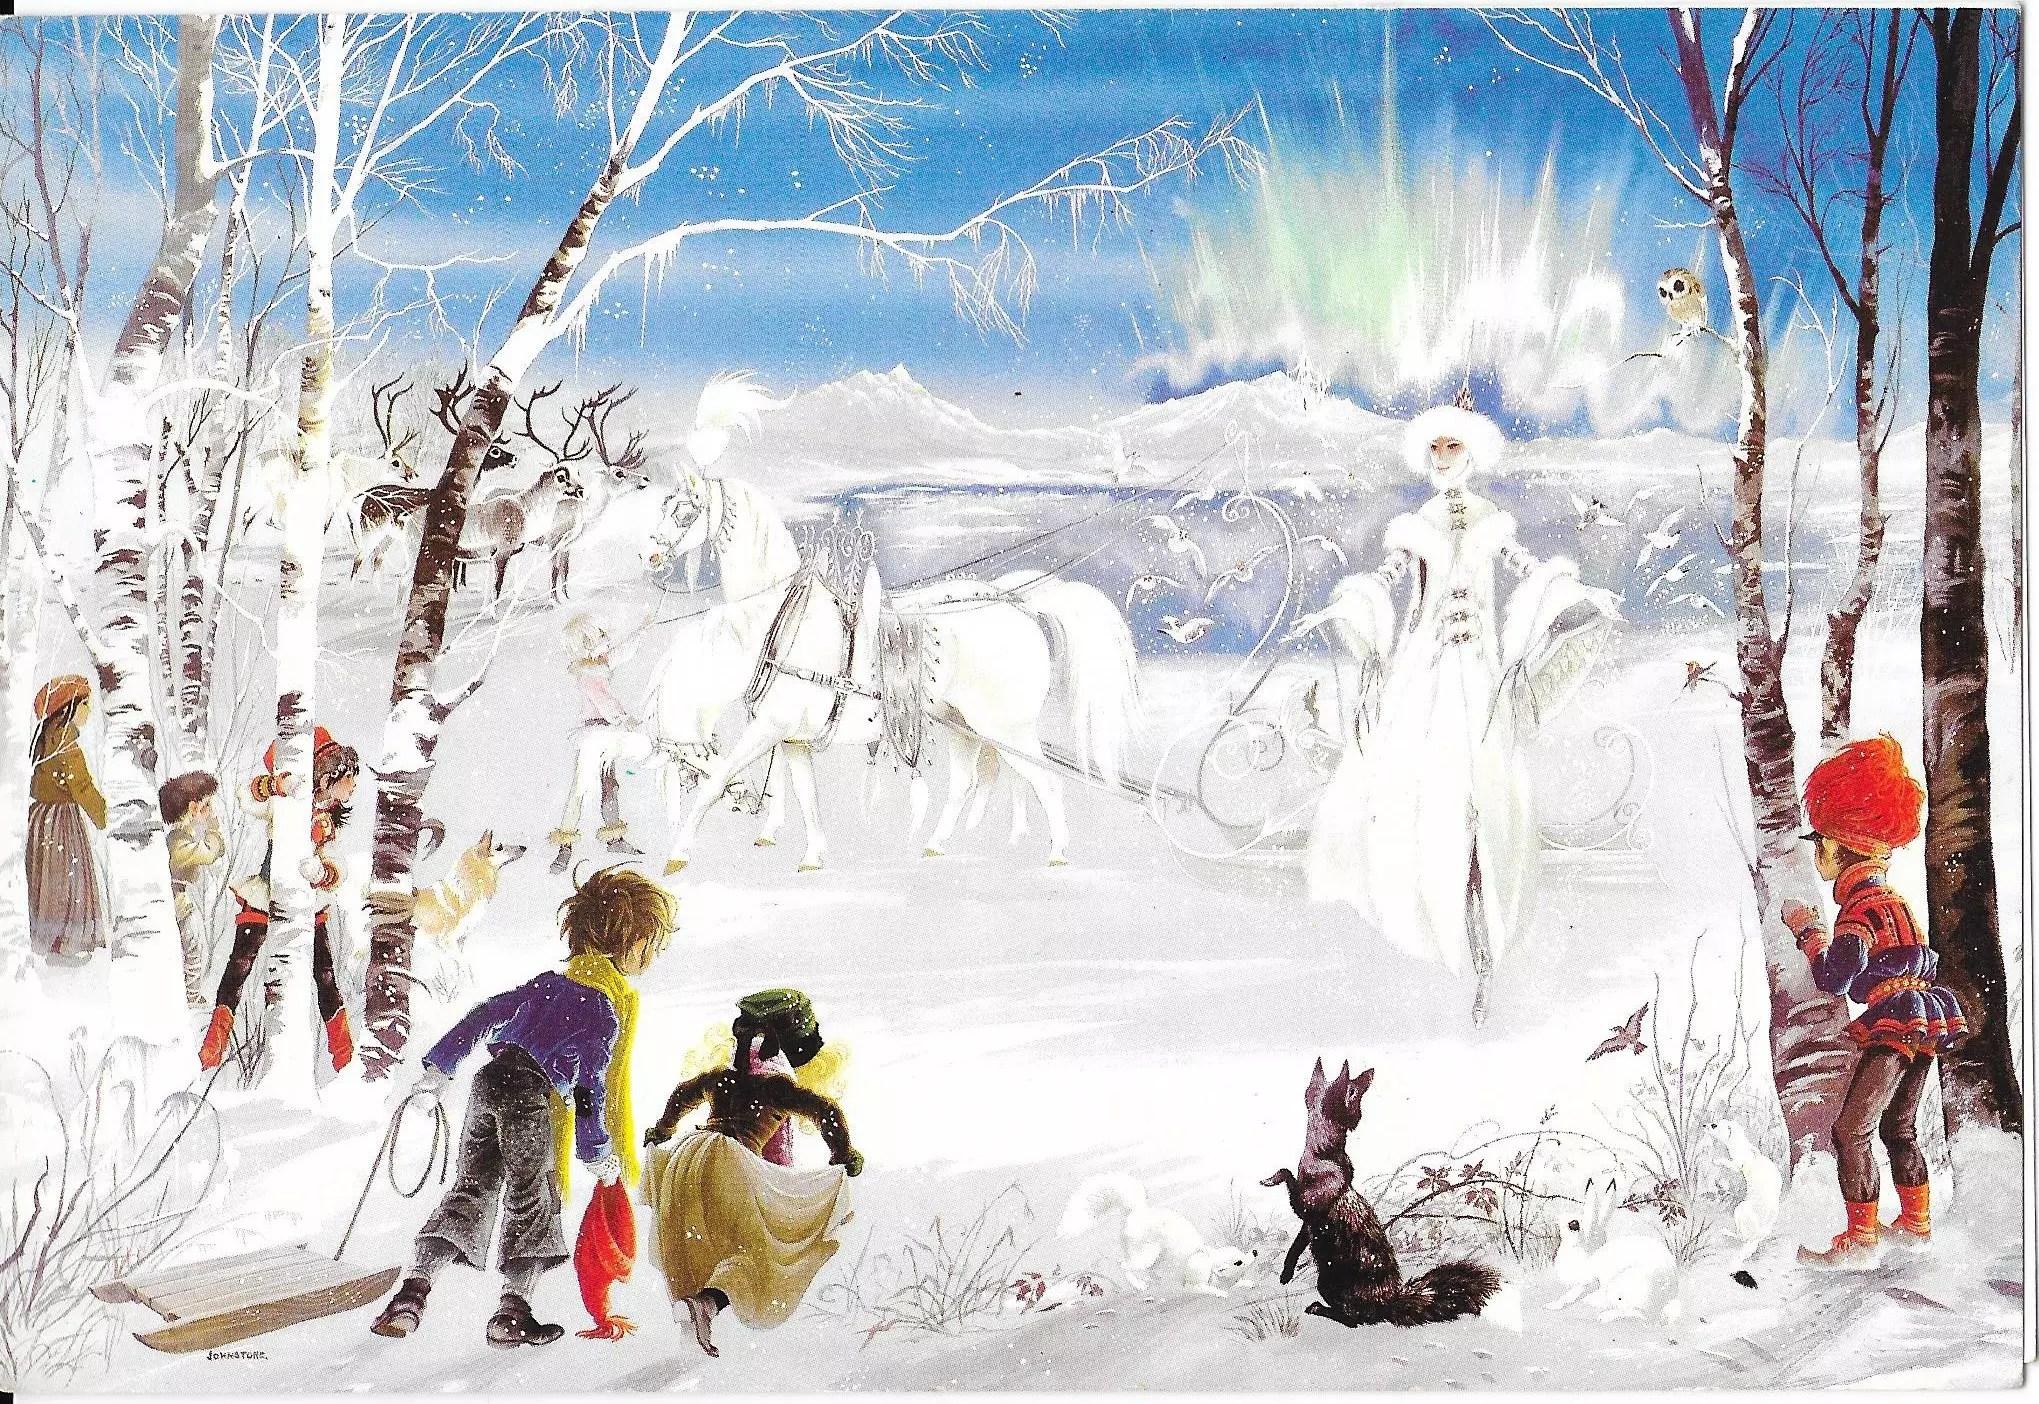 Janet Anne Grahame Johnstone illus The Snow Queen 2